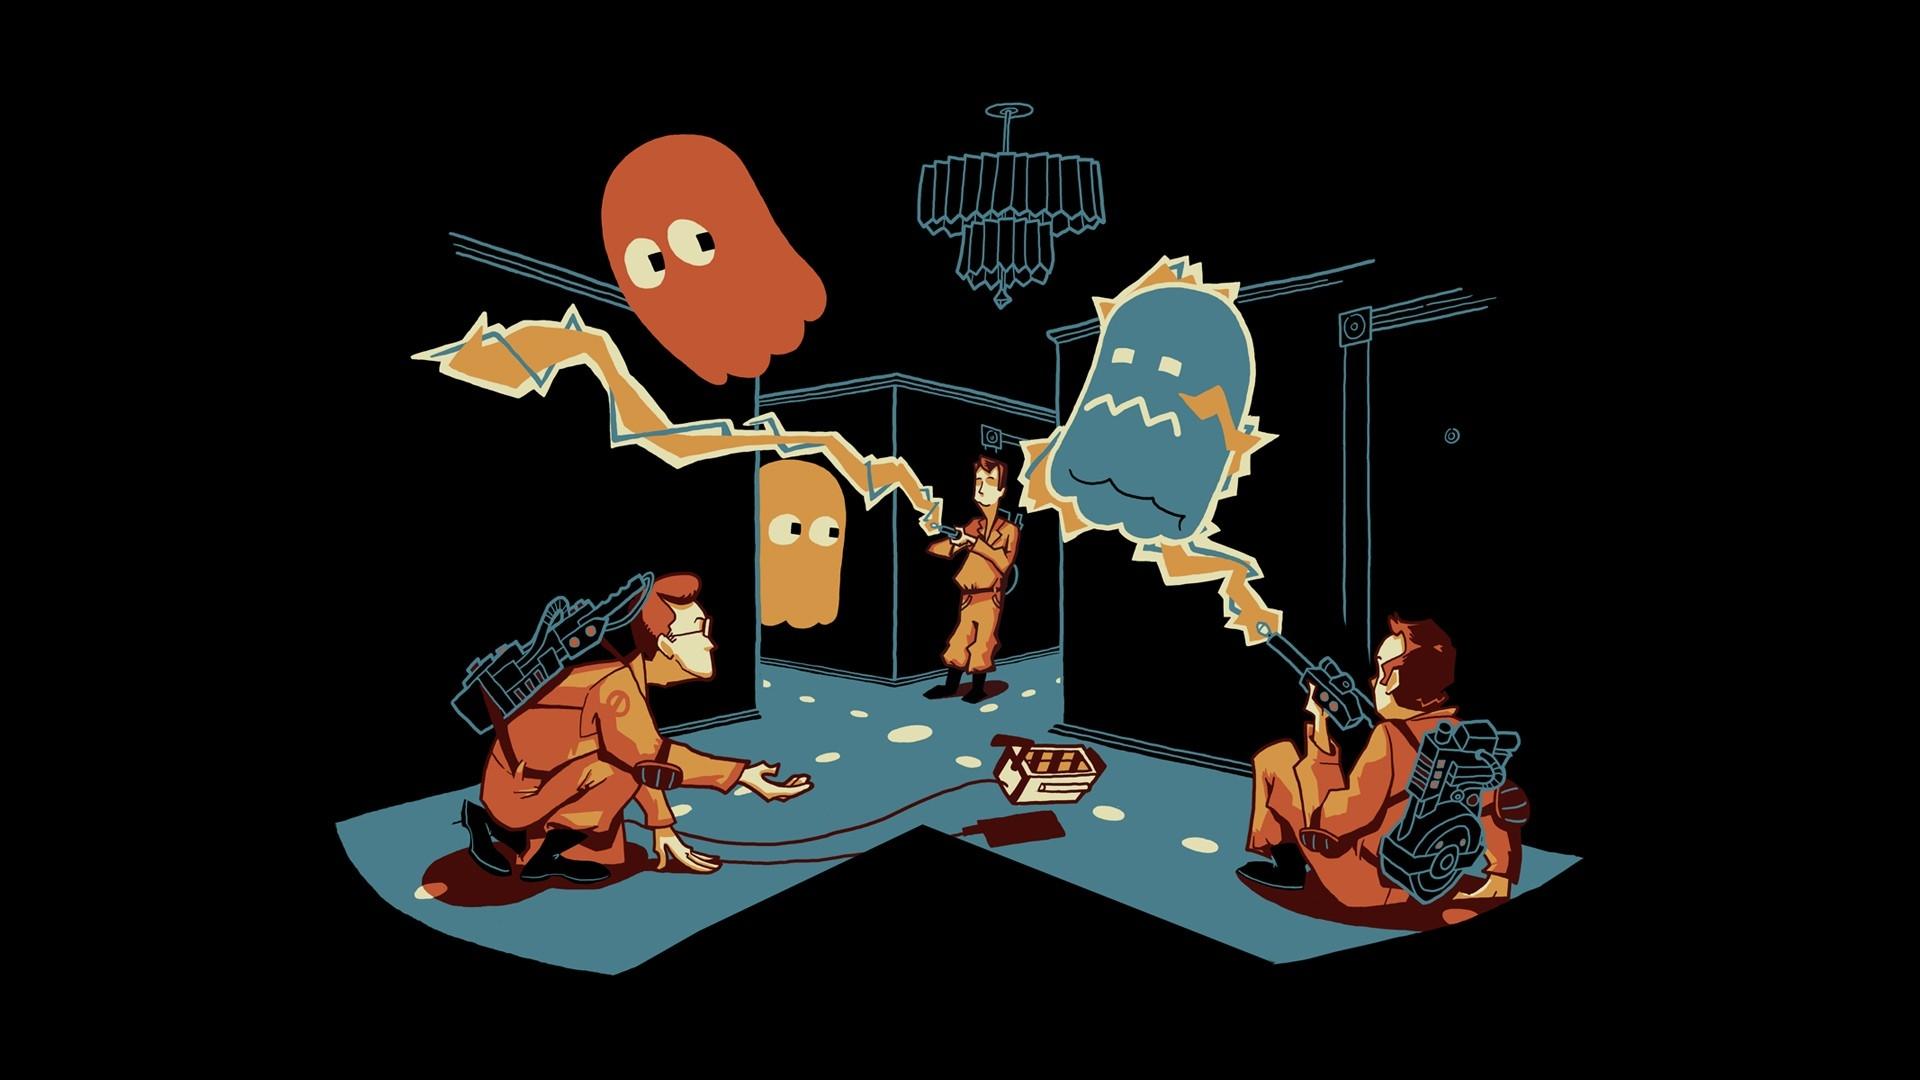 ghostbusters pacman hd wallpaper